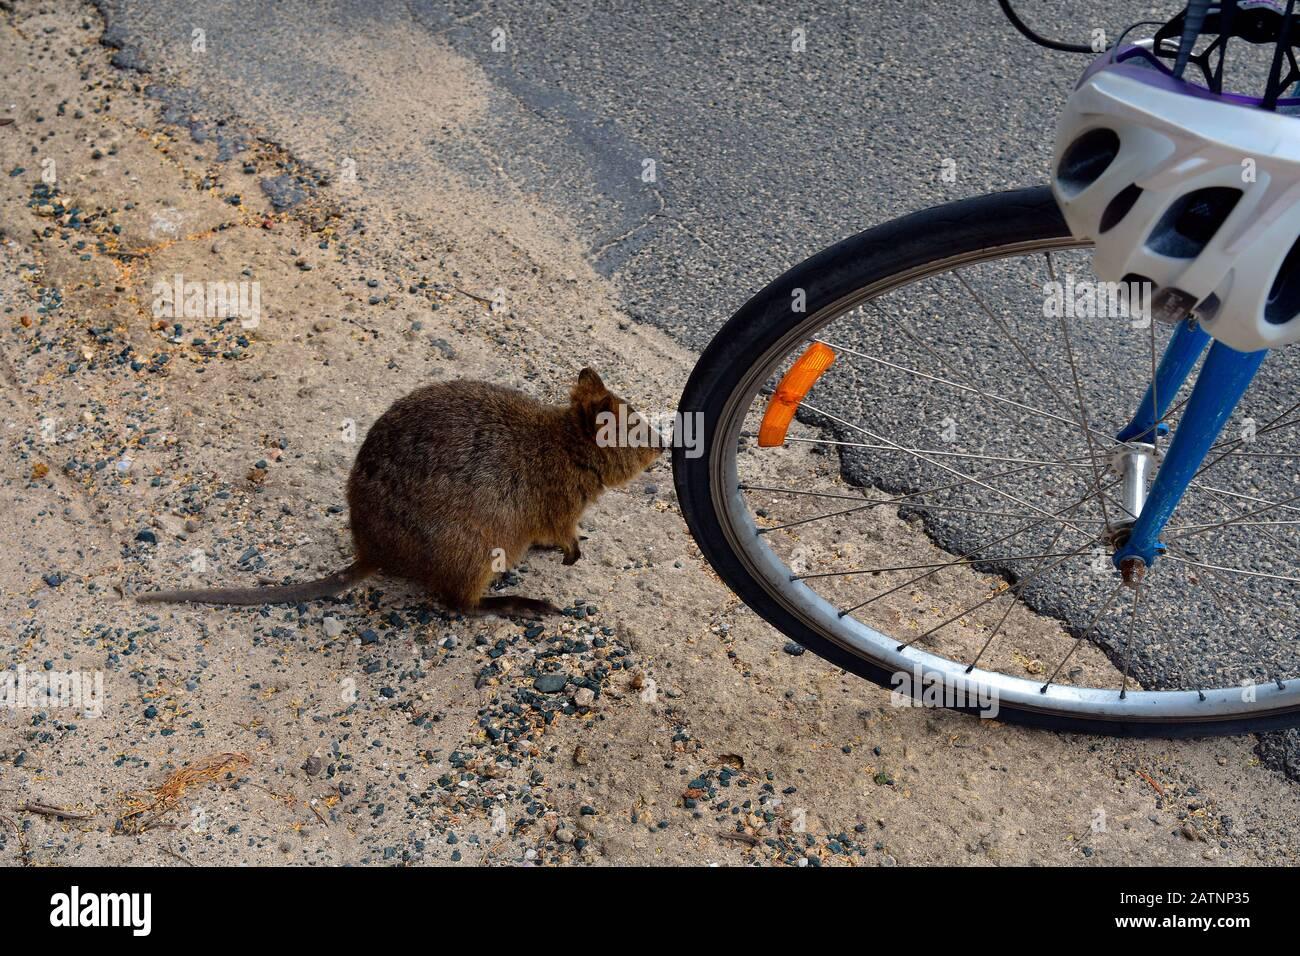 Australia, curious Quokka with bicycle on Rottnest Island Stock Photo -  Alamy